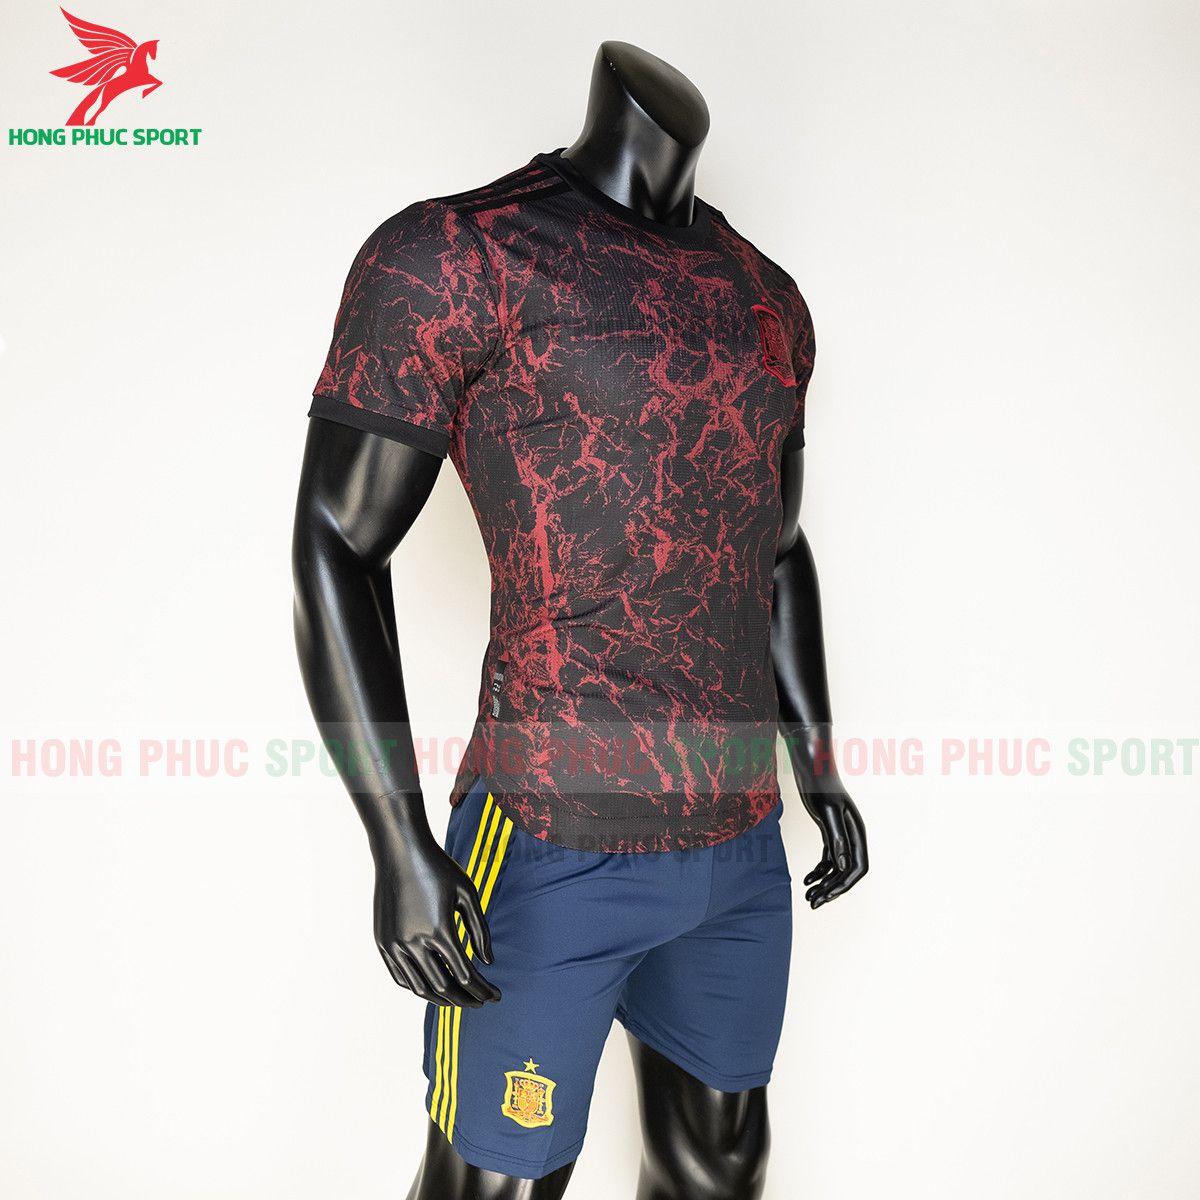 https://cdn.hongphucsport.com/unsafe/s4.shopbay.vn/files/285/ao-bong-da-training-tuyen-tay-ban-nha-euro-2021-thailand-2-61558c4706599.jpg